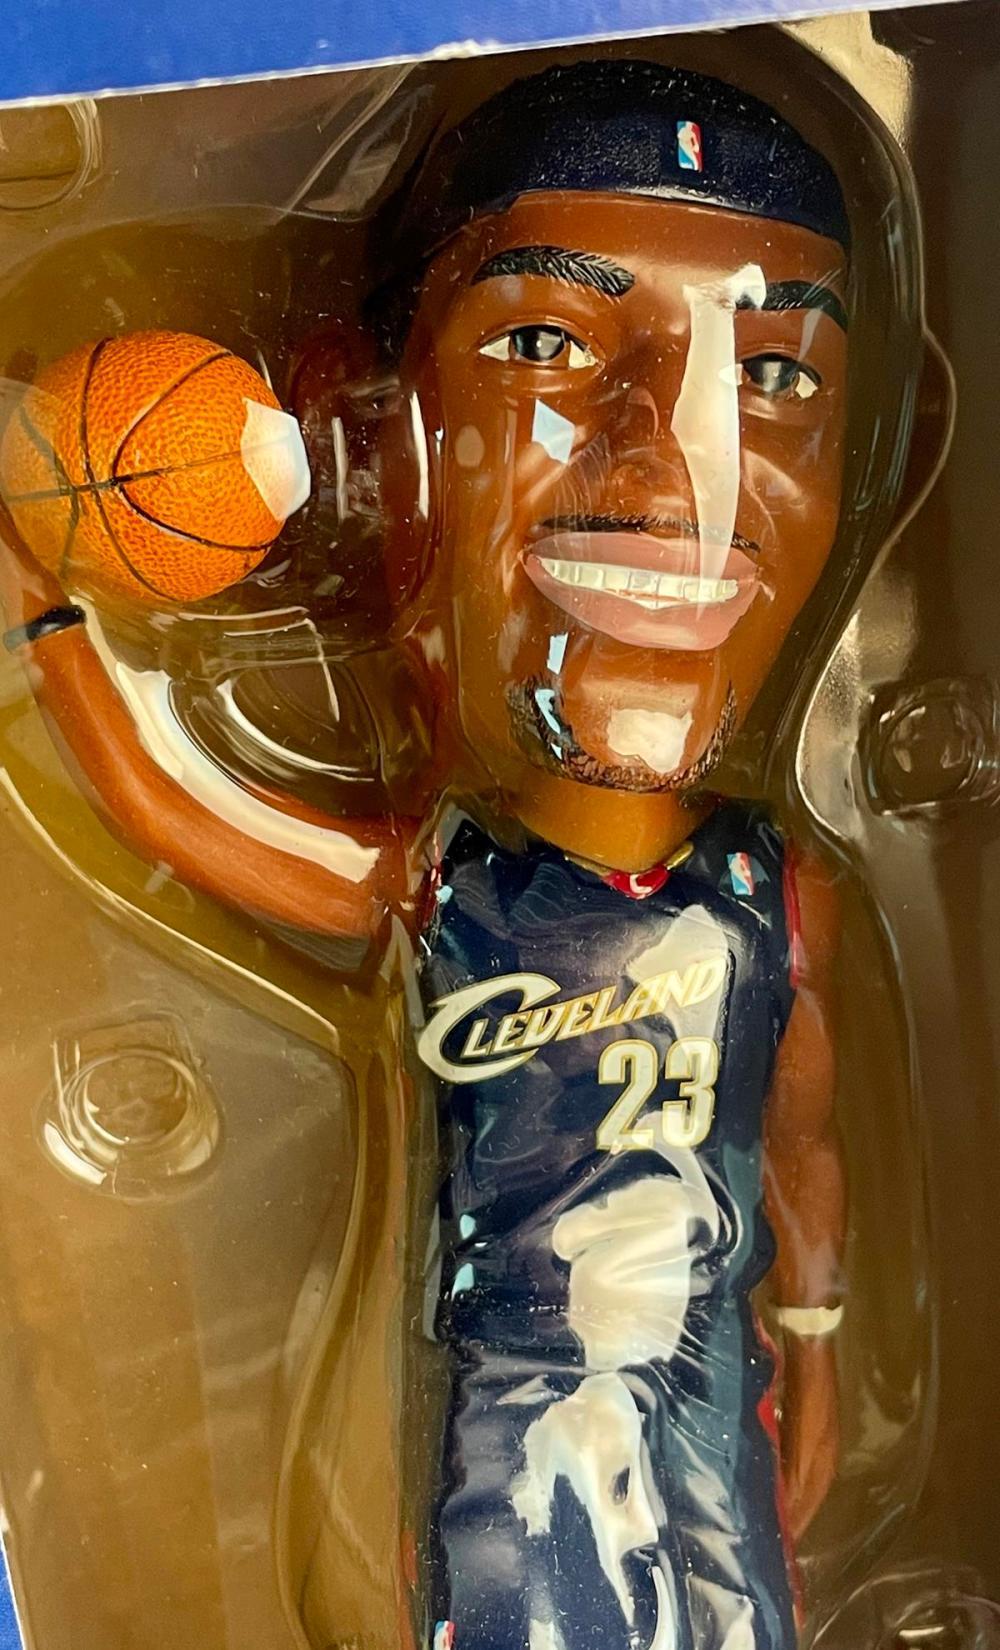 2005 LeBron James Cleveland Cavaliers SGA Stadium Giveaway Ltd Ed Bobblehead NIB